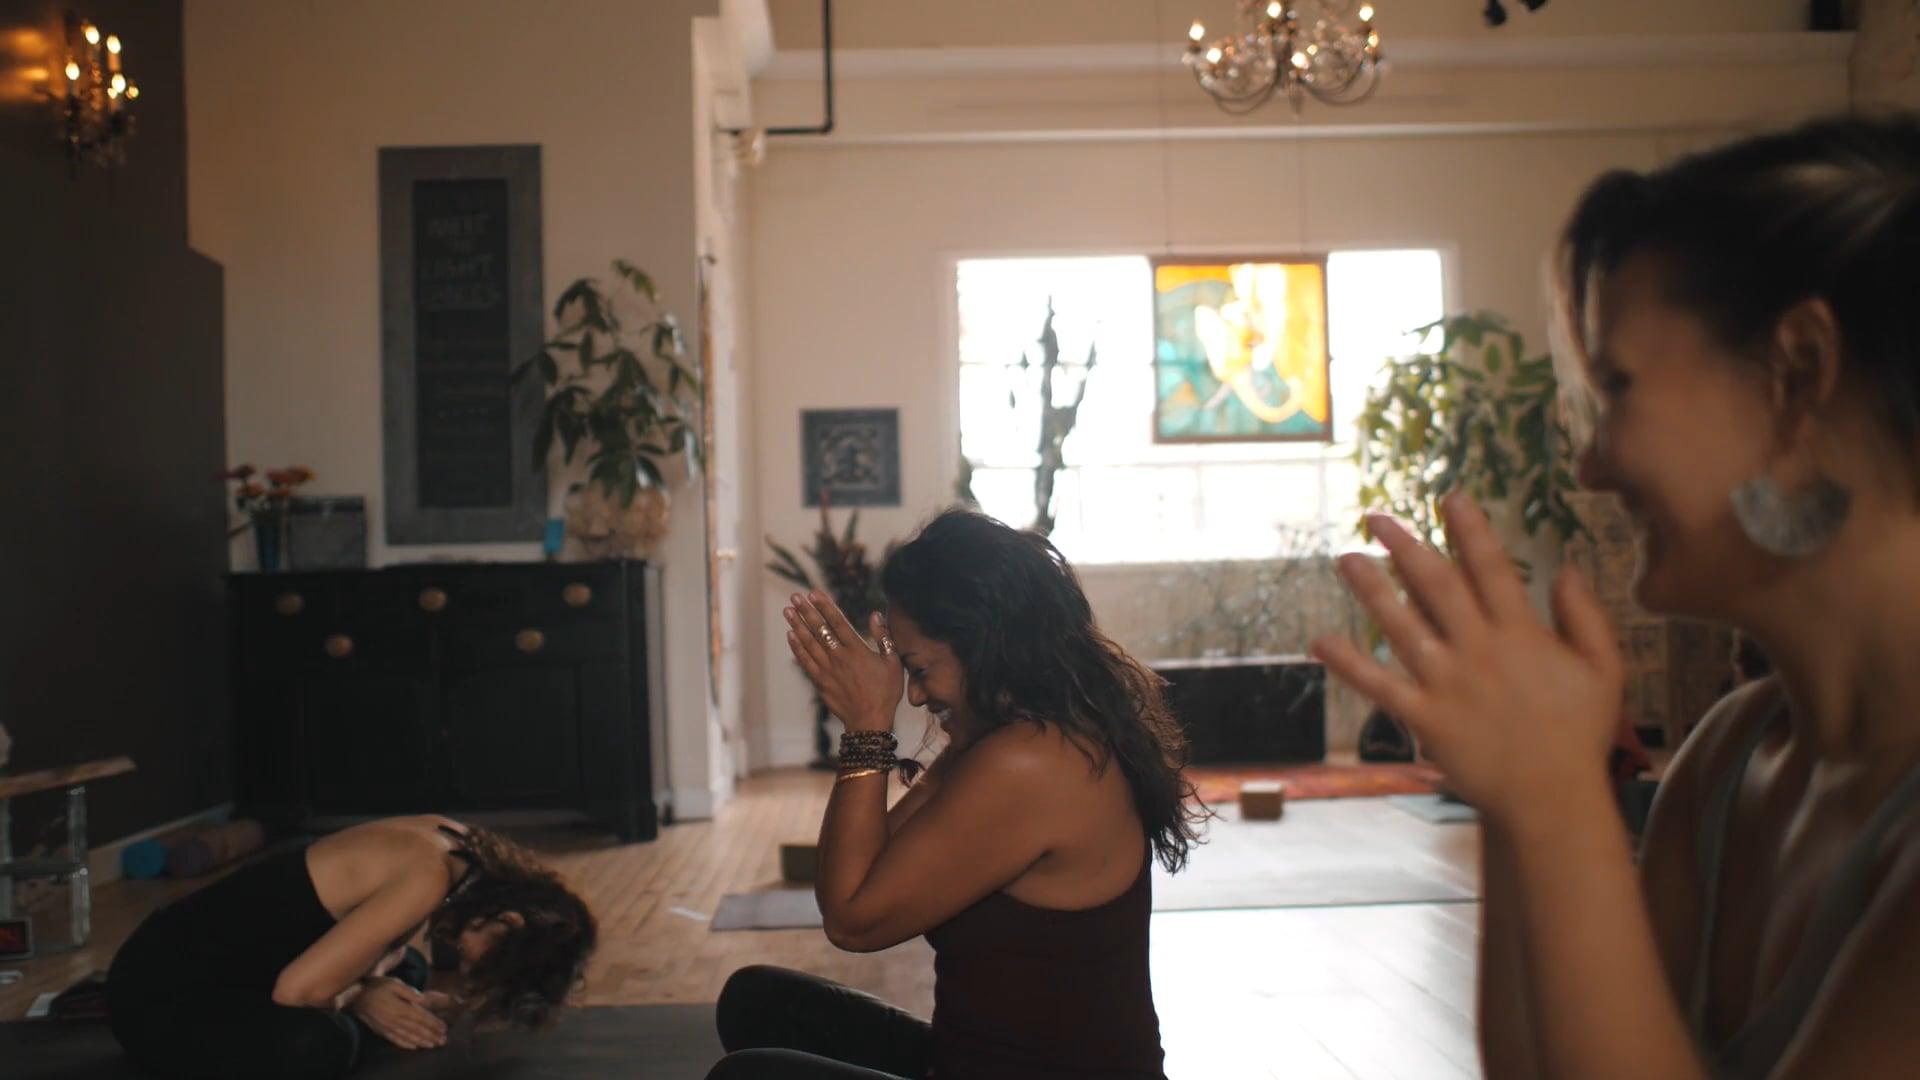 Nirvana Yoga Studio   Invite the Light